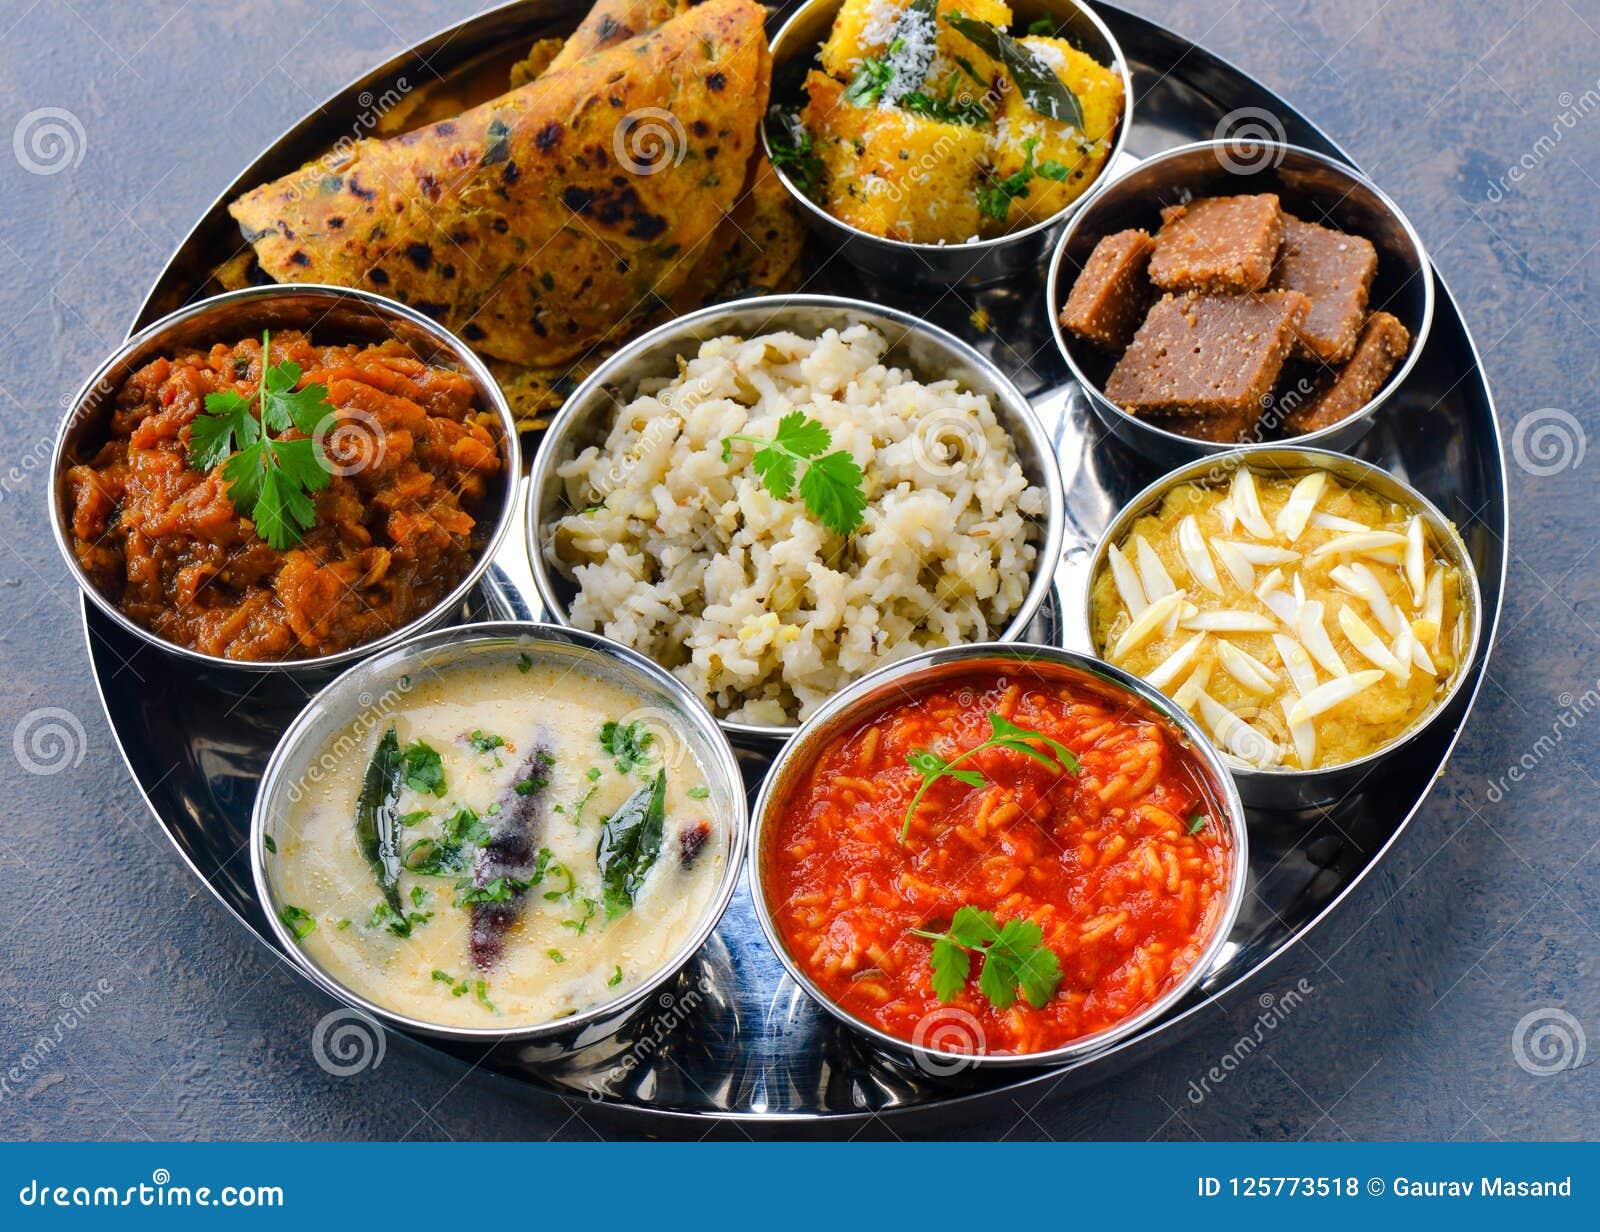 Gujarati Thaali Vegetarian Indian Meal Stock Photo Image